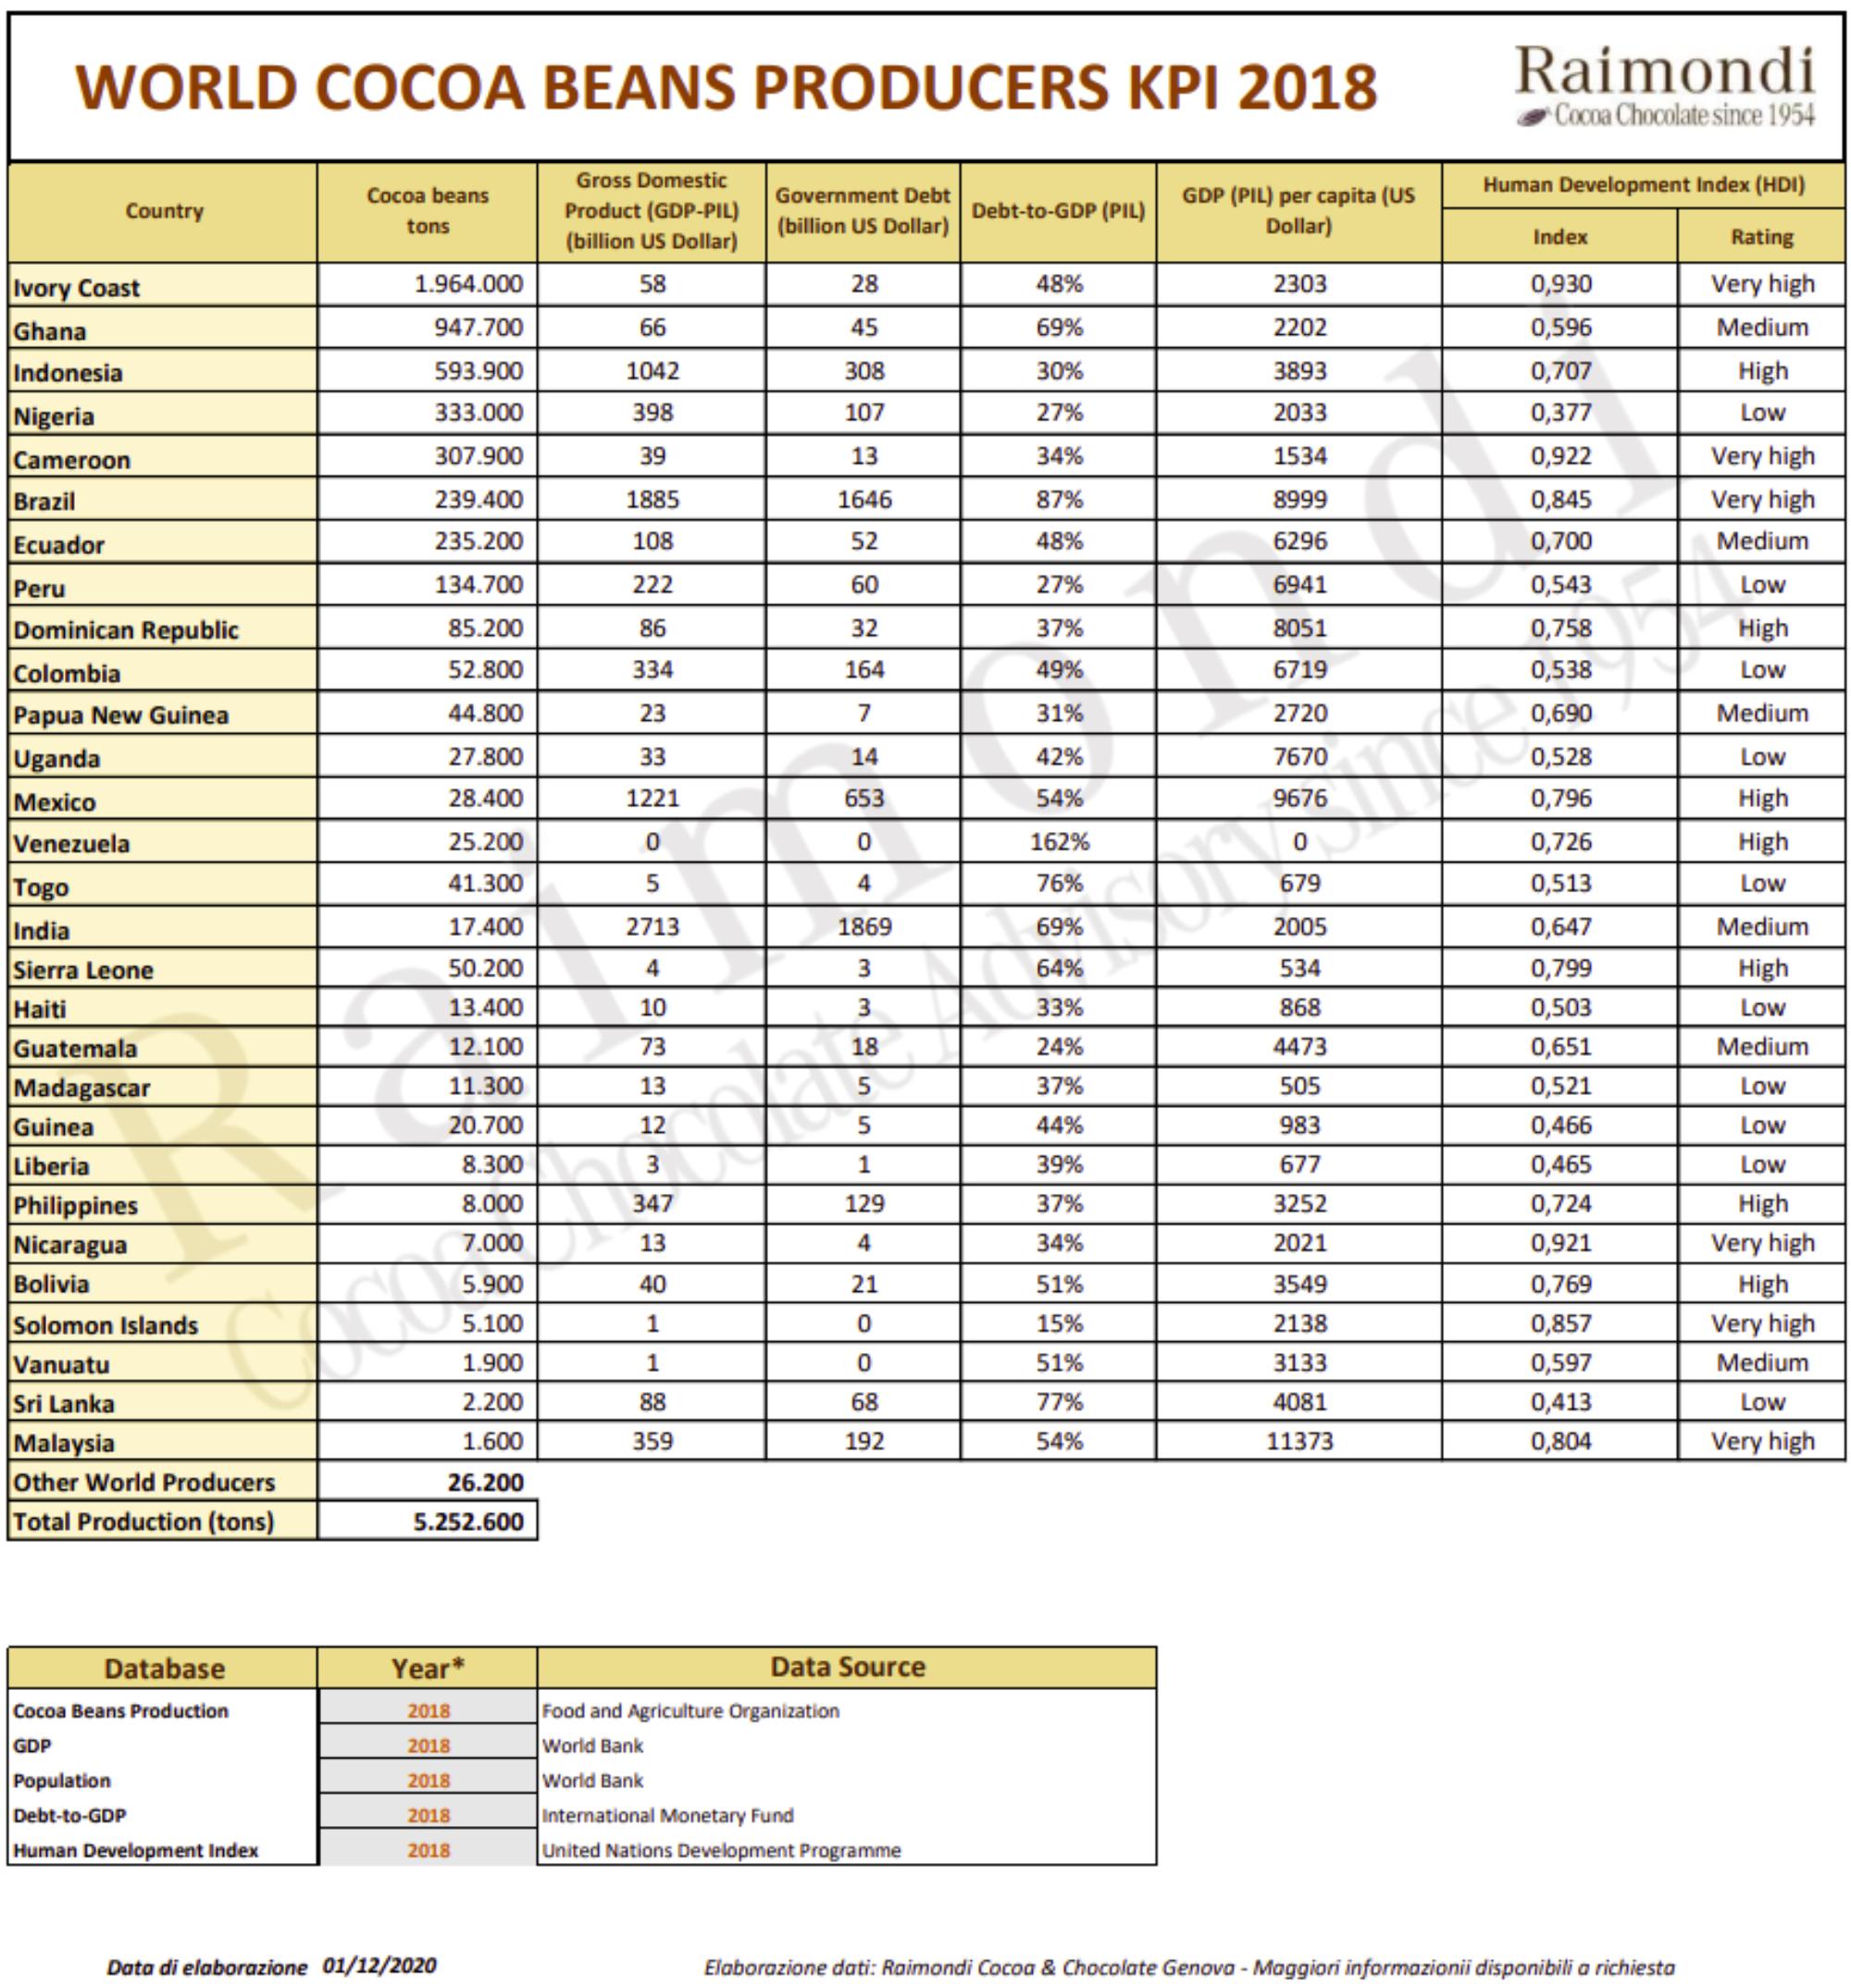 2020-12-03 15_46_01-World Cocoa Beans Producers KPI 2018 (Marta Giobbe).pdf - Personale - Microsoft